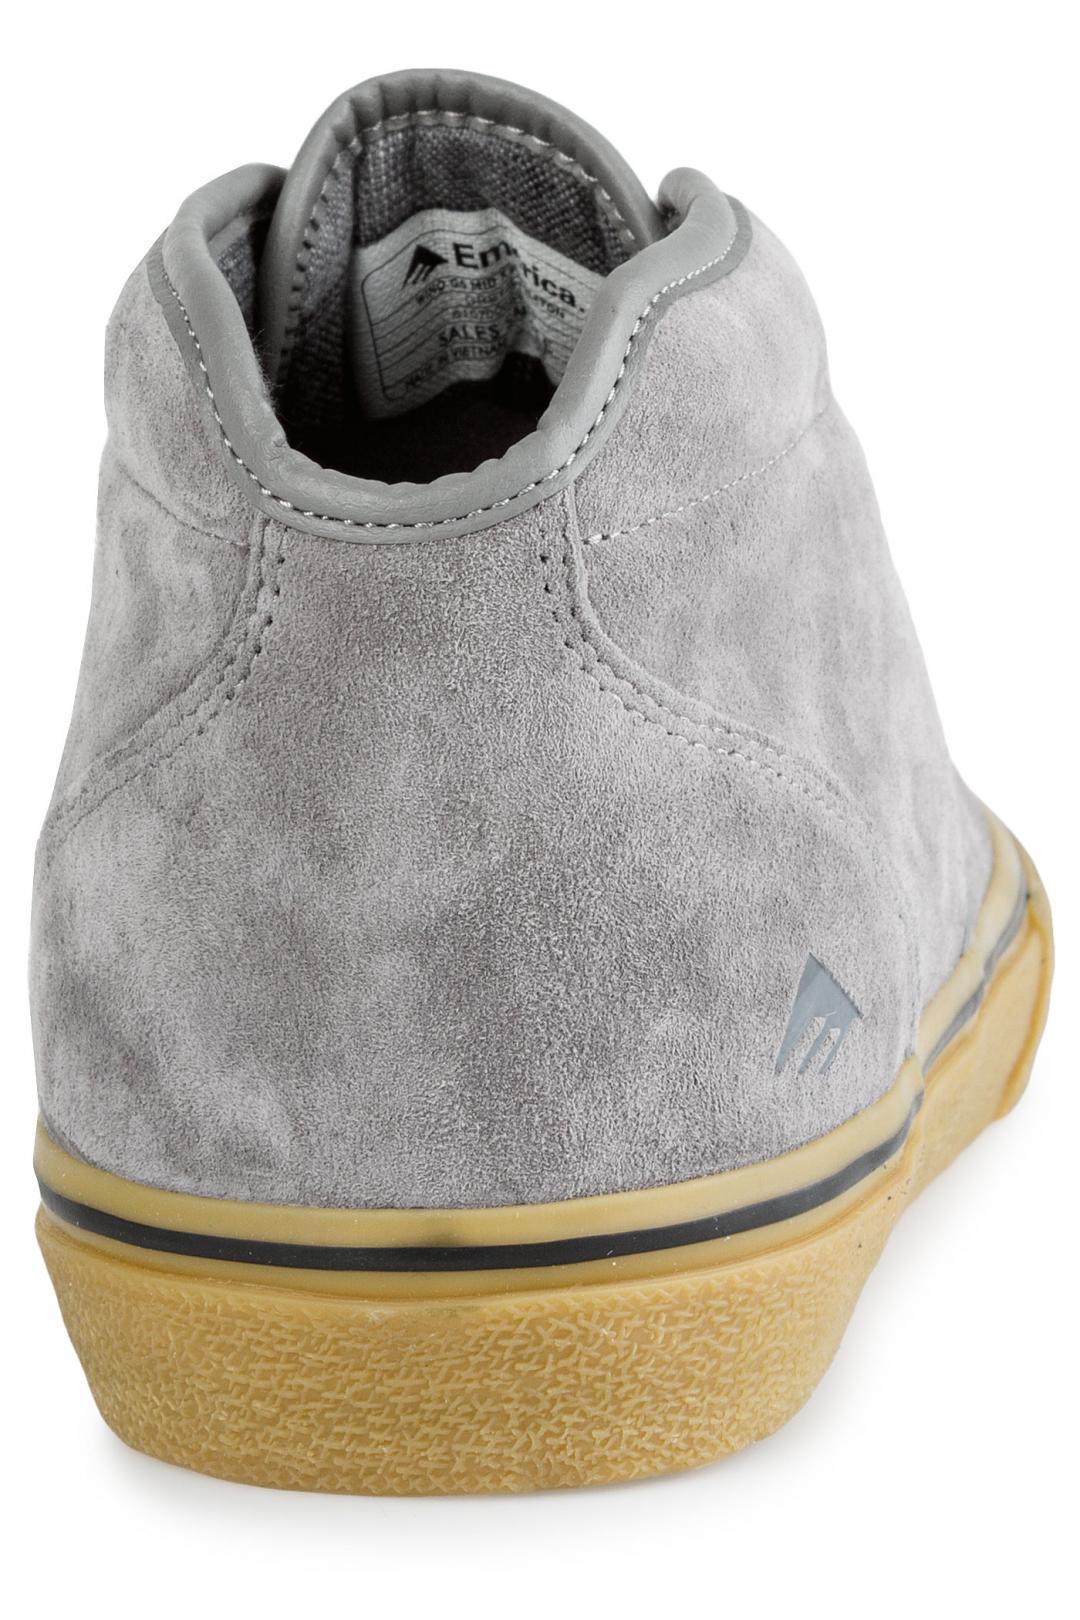 Uomo Emerica x Pendleton Wino G6 Mid grey gum   Sneakers mid top